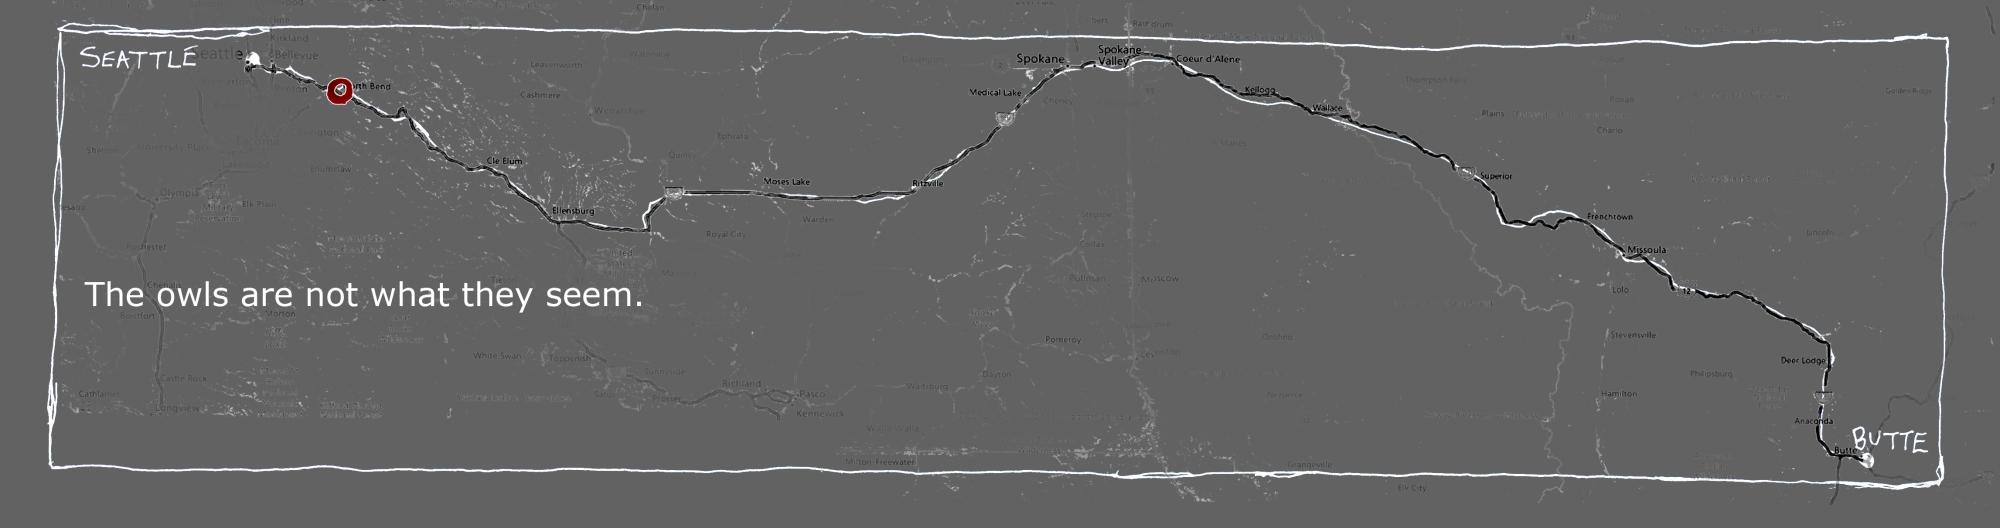 6 map grey